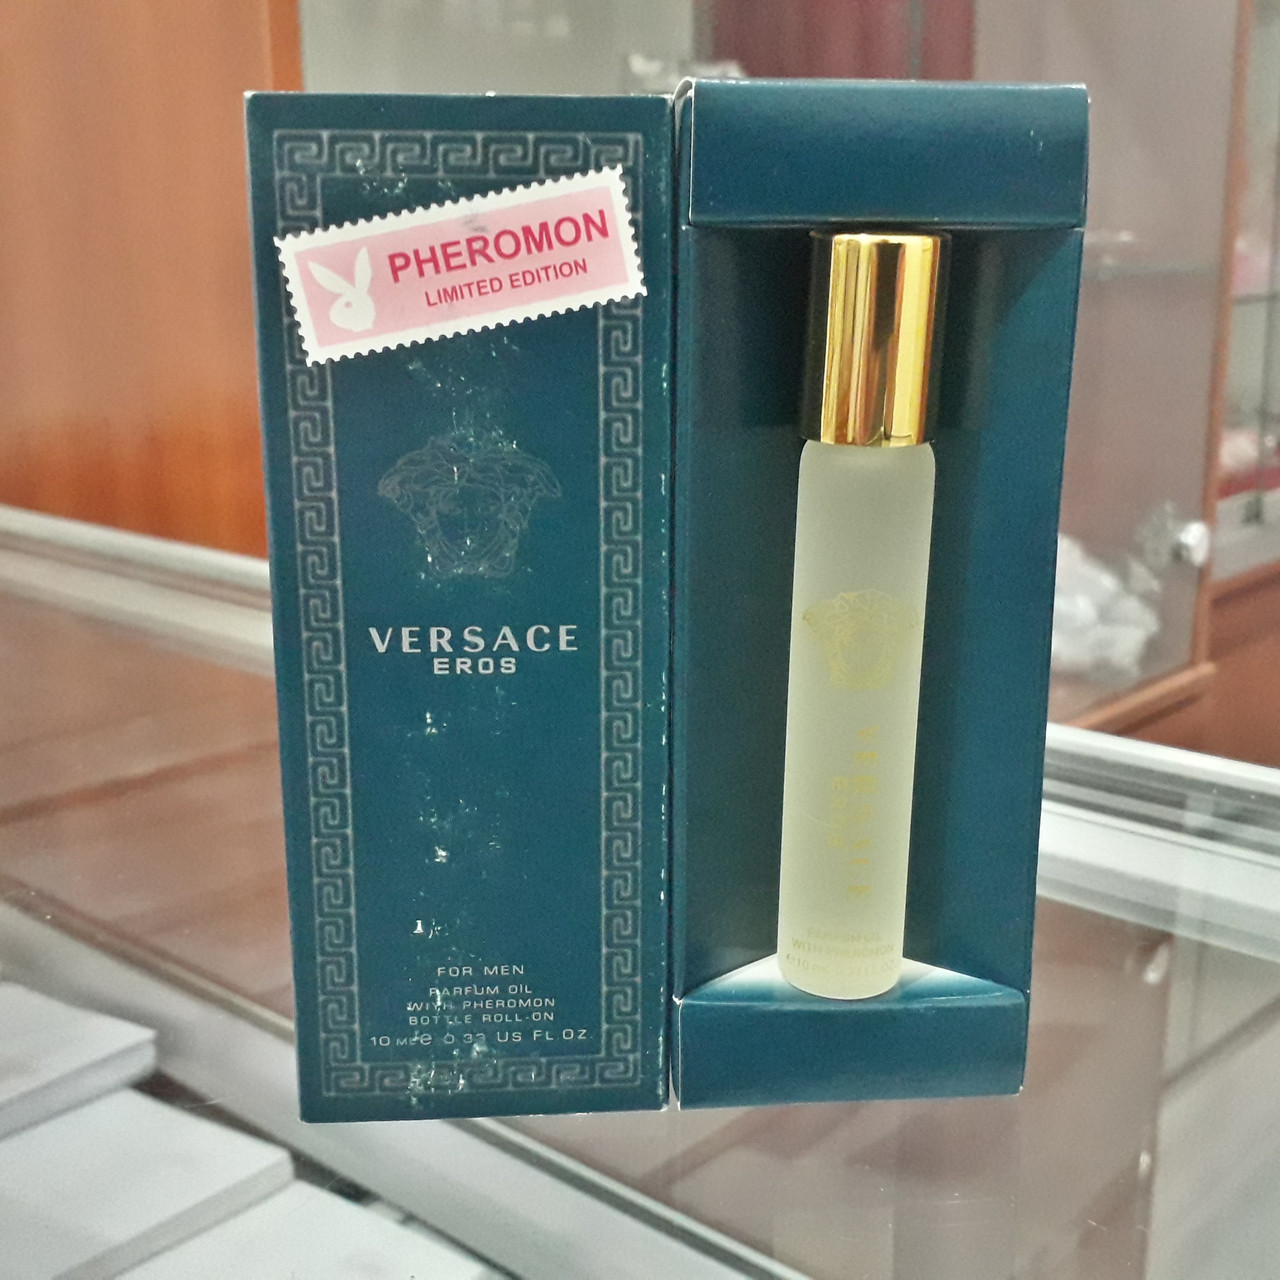 Духи с феромонами Versace Eros, 10 ml.